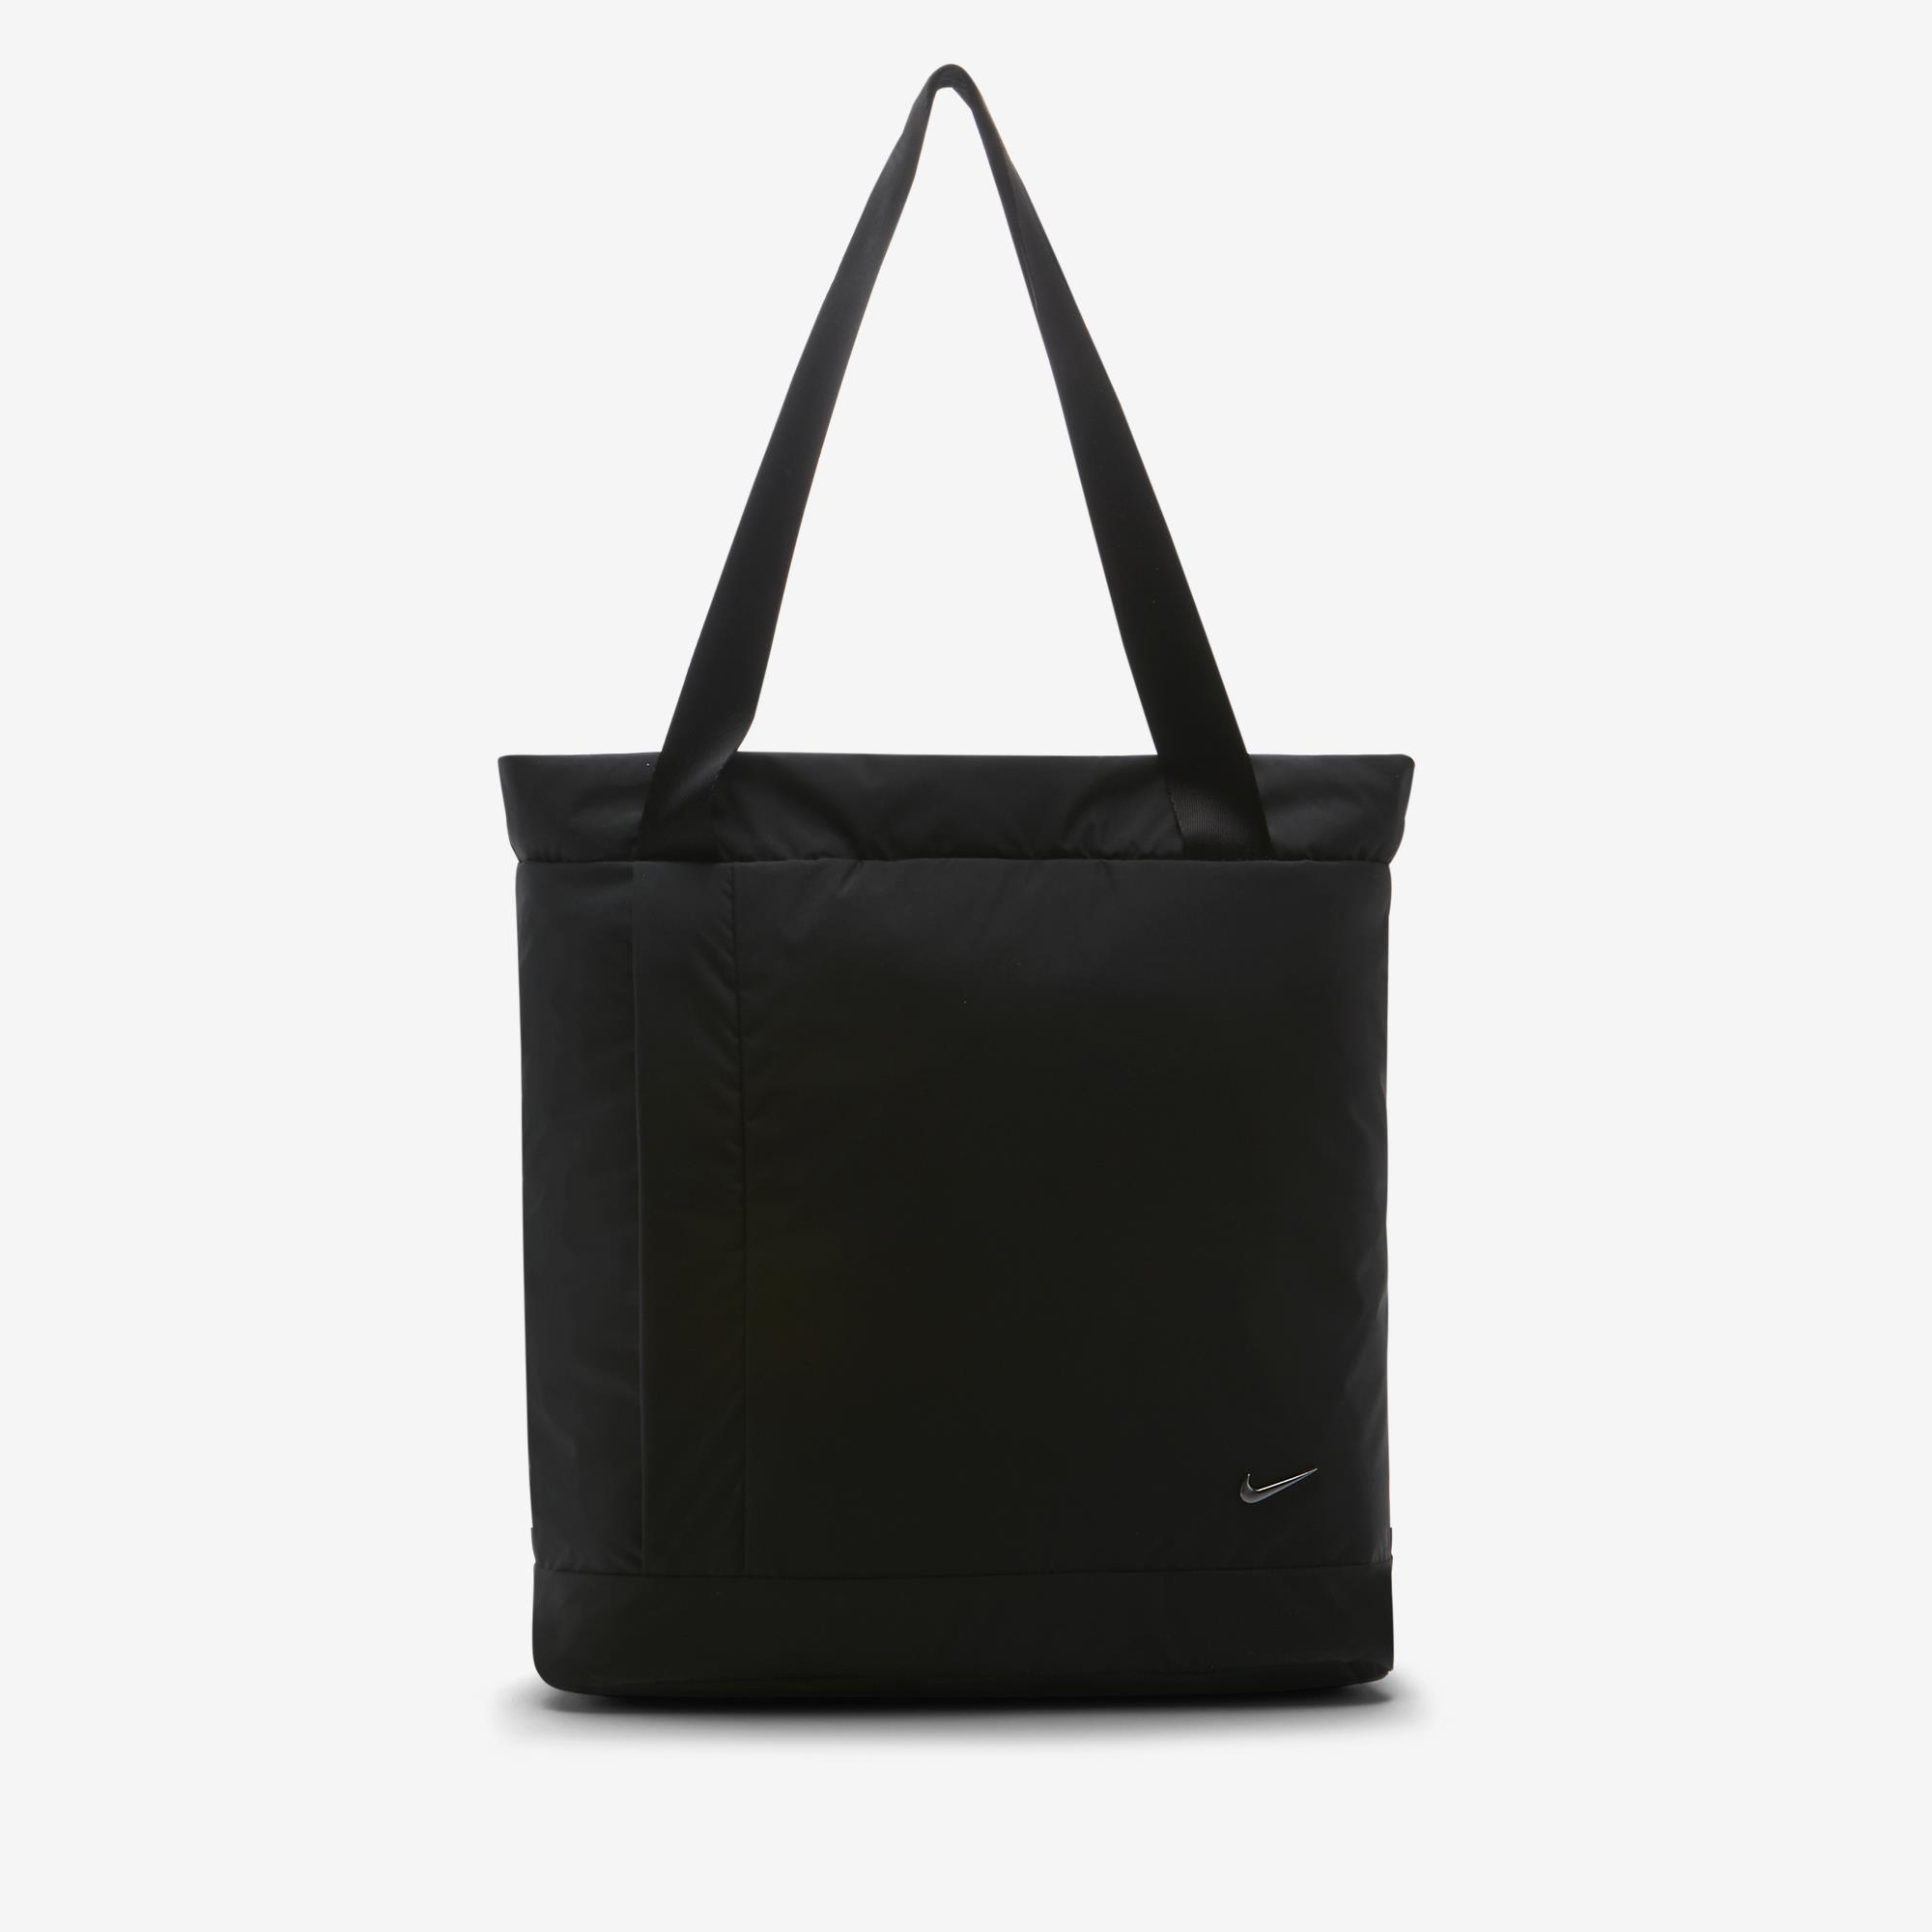 Bolsa Nike Legendary Tote